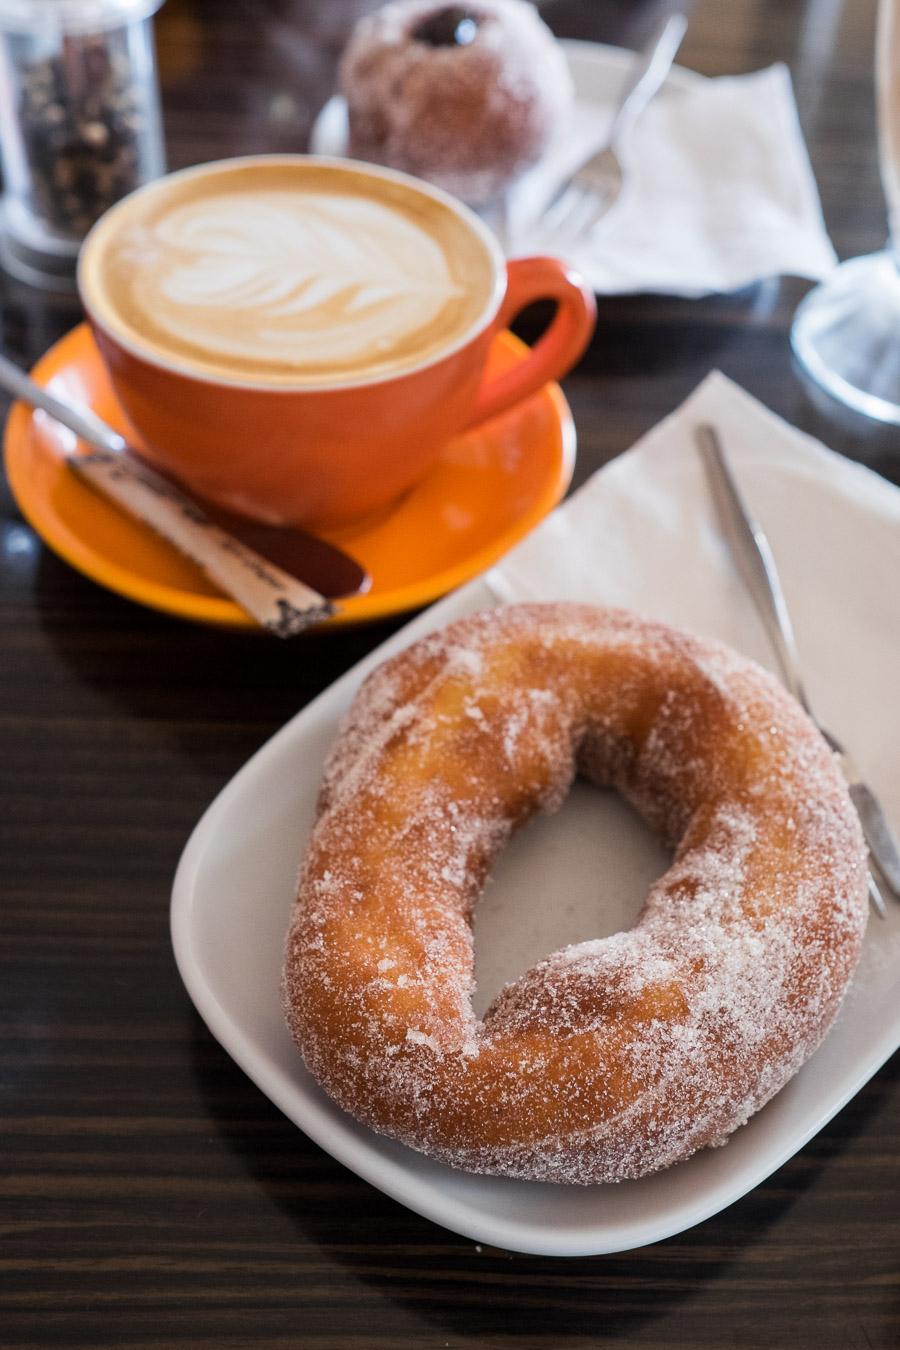 Doughnut and coffee